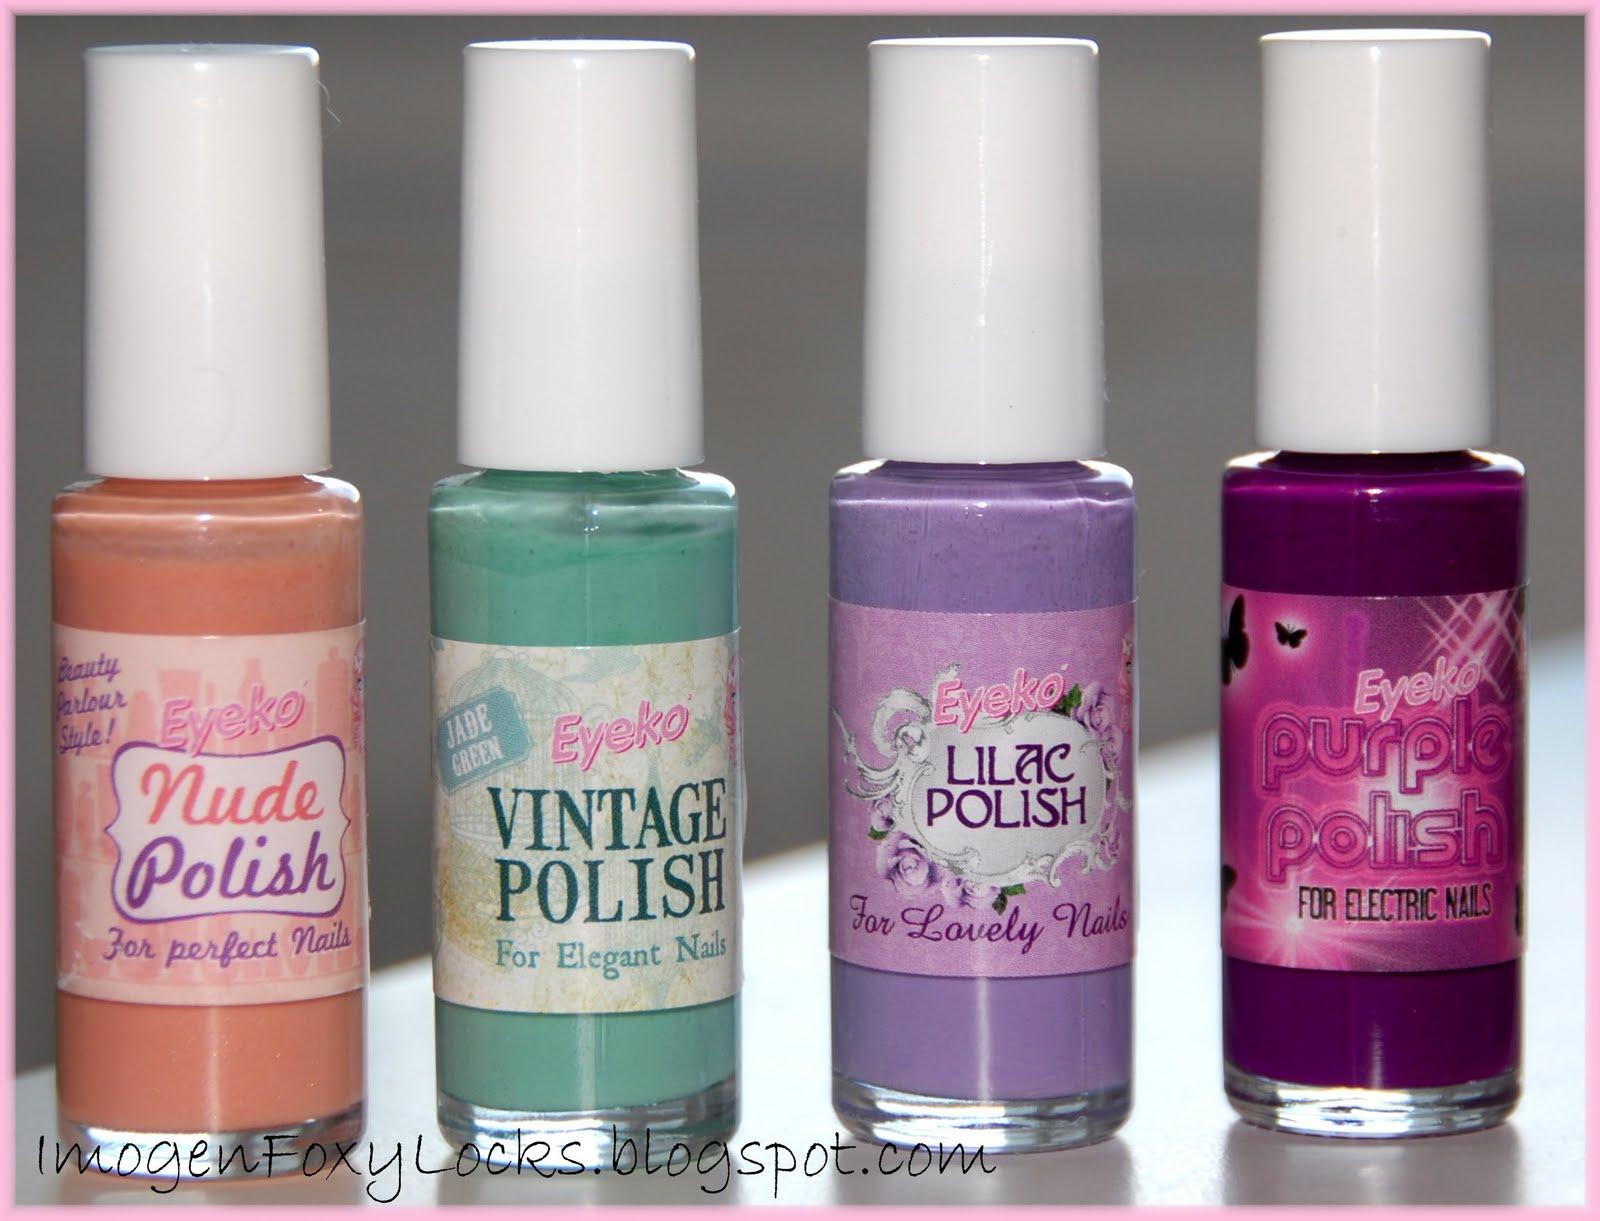 Imogen Foxy Locks: Pretty Nails On A Budget: Eyeko Nail Polish